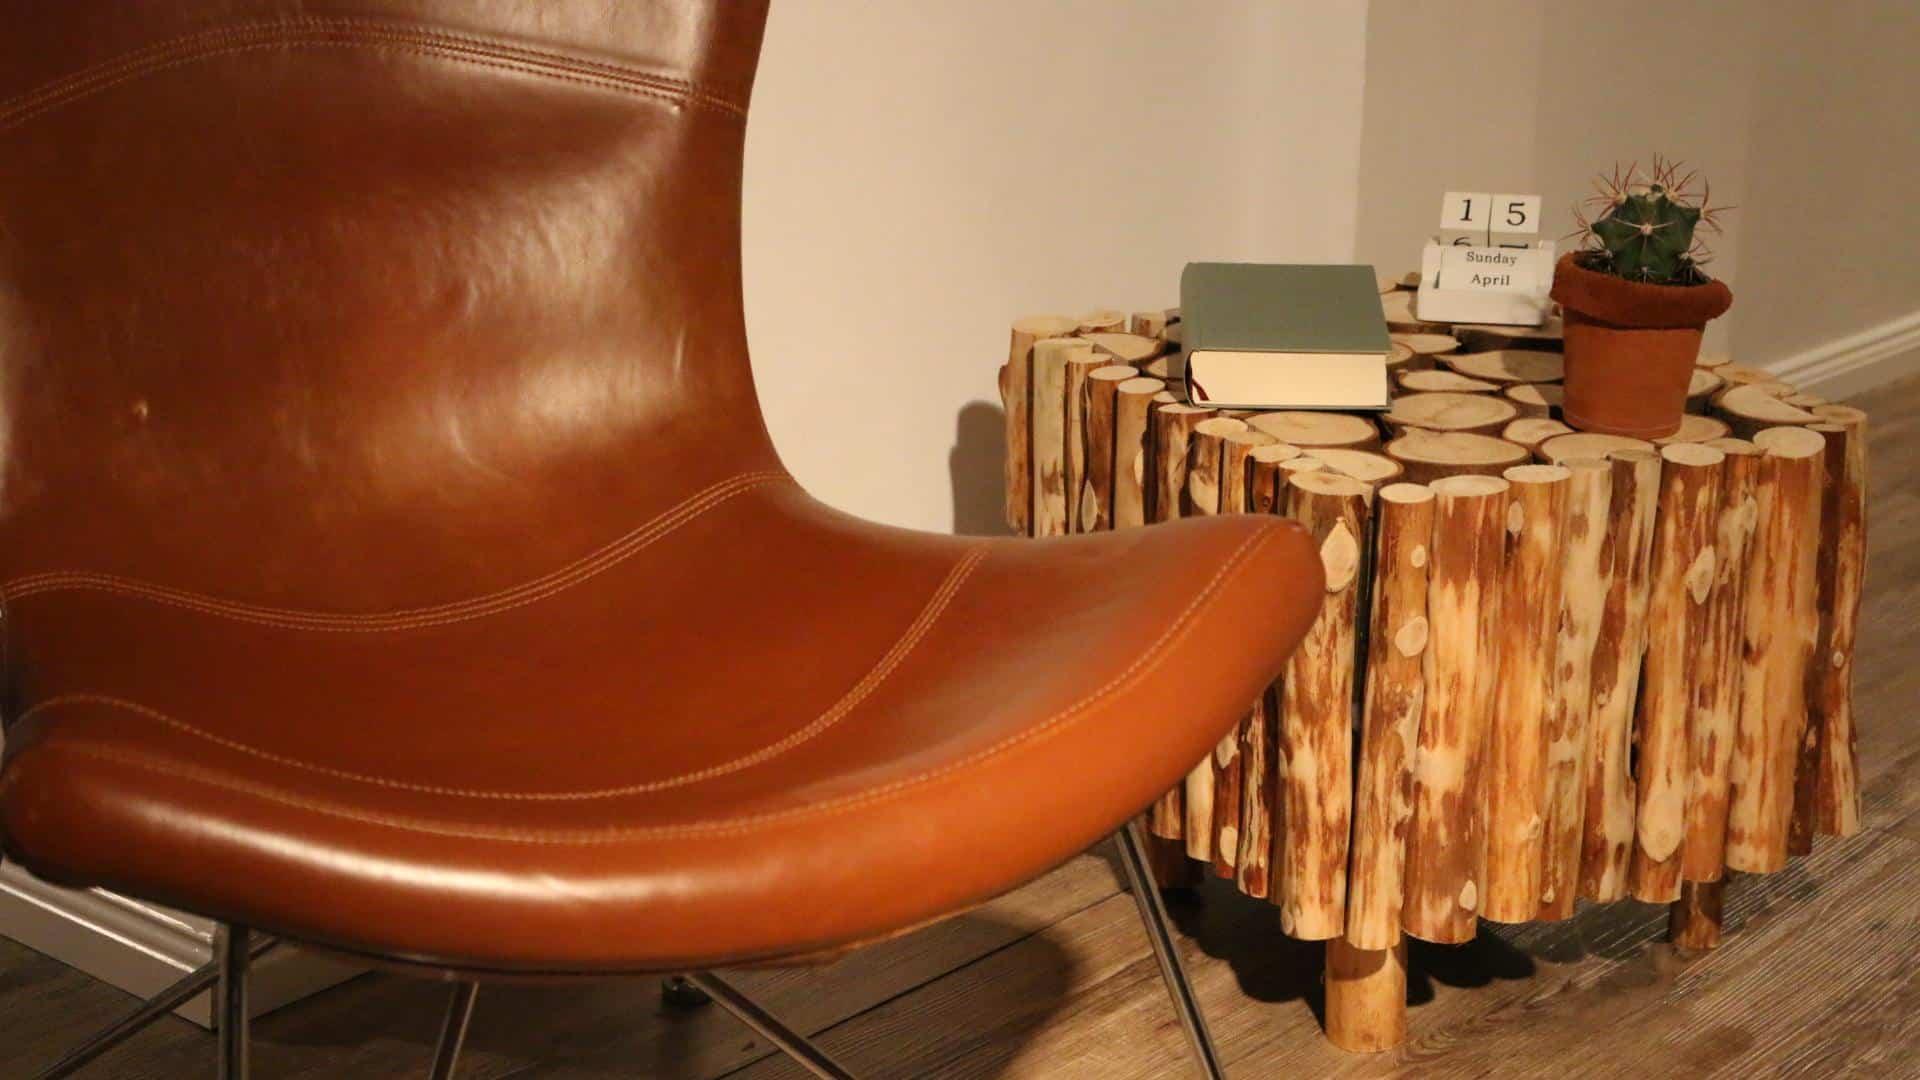 beistelltisch aus altholz selber bauen diy ideen anleitung. Black Bedroom Furniture Sets. Home Design Ideas